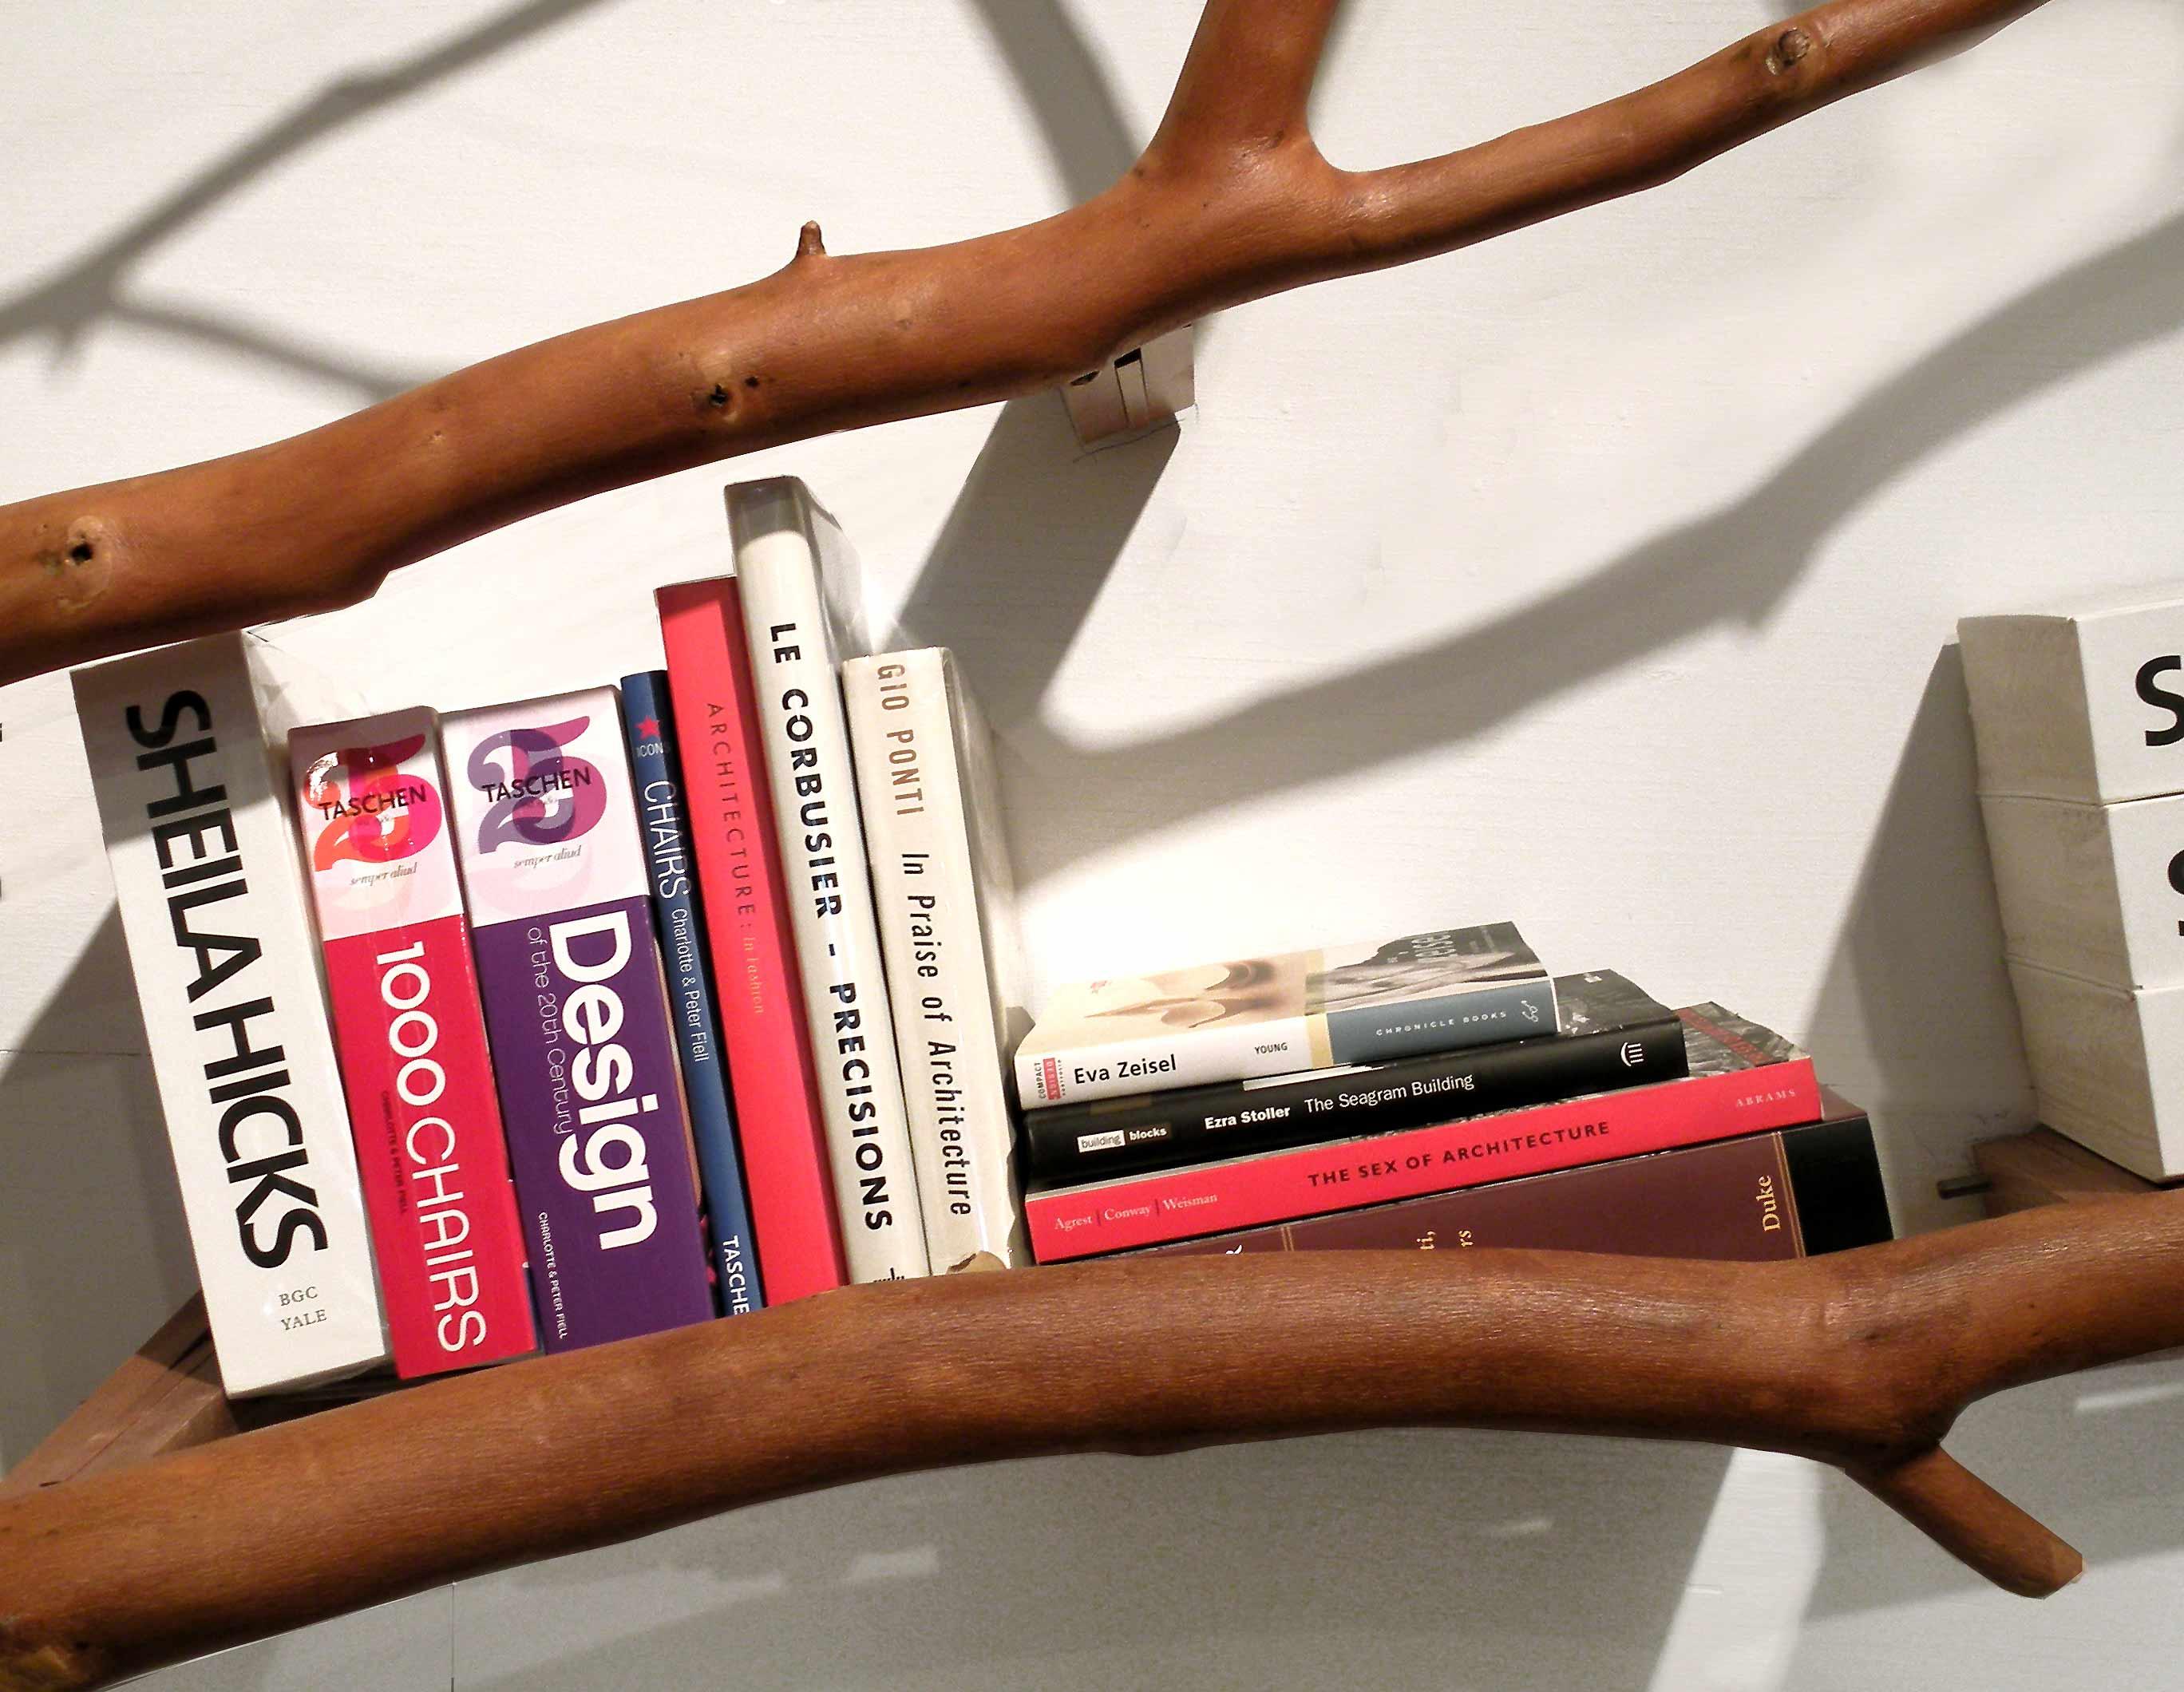 Top 5 Creative Bookshelves I Envy   The Envy Collection